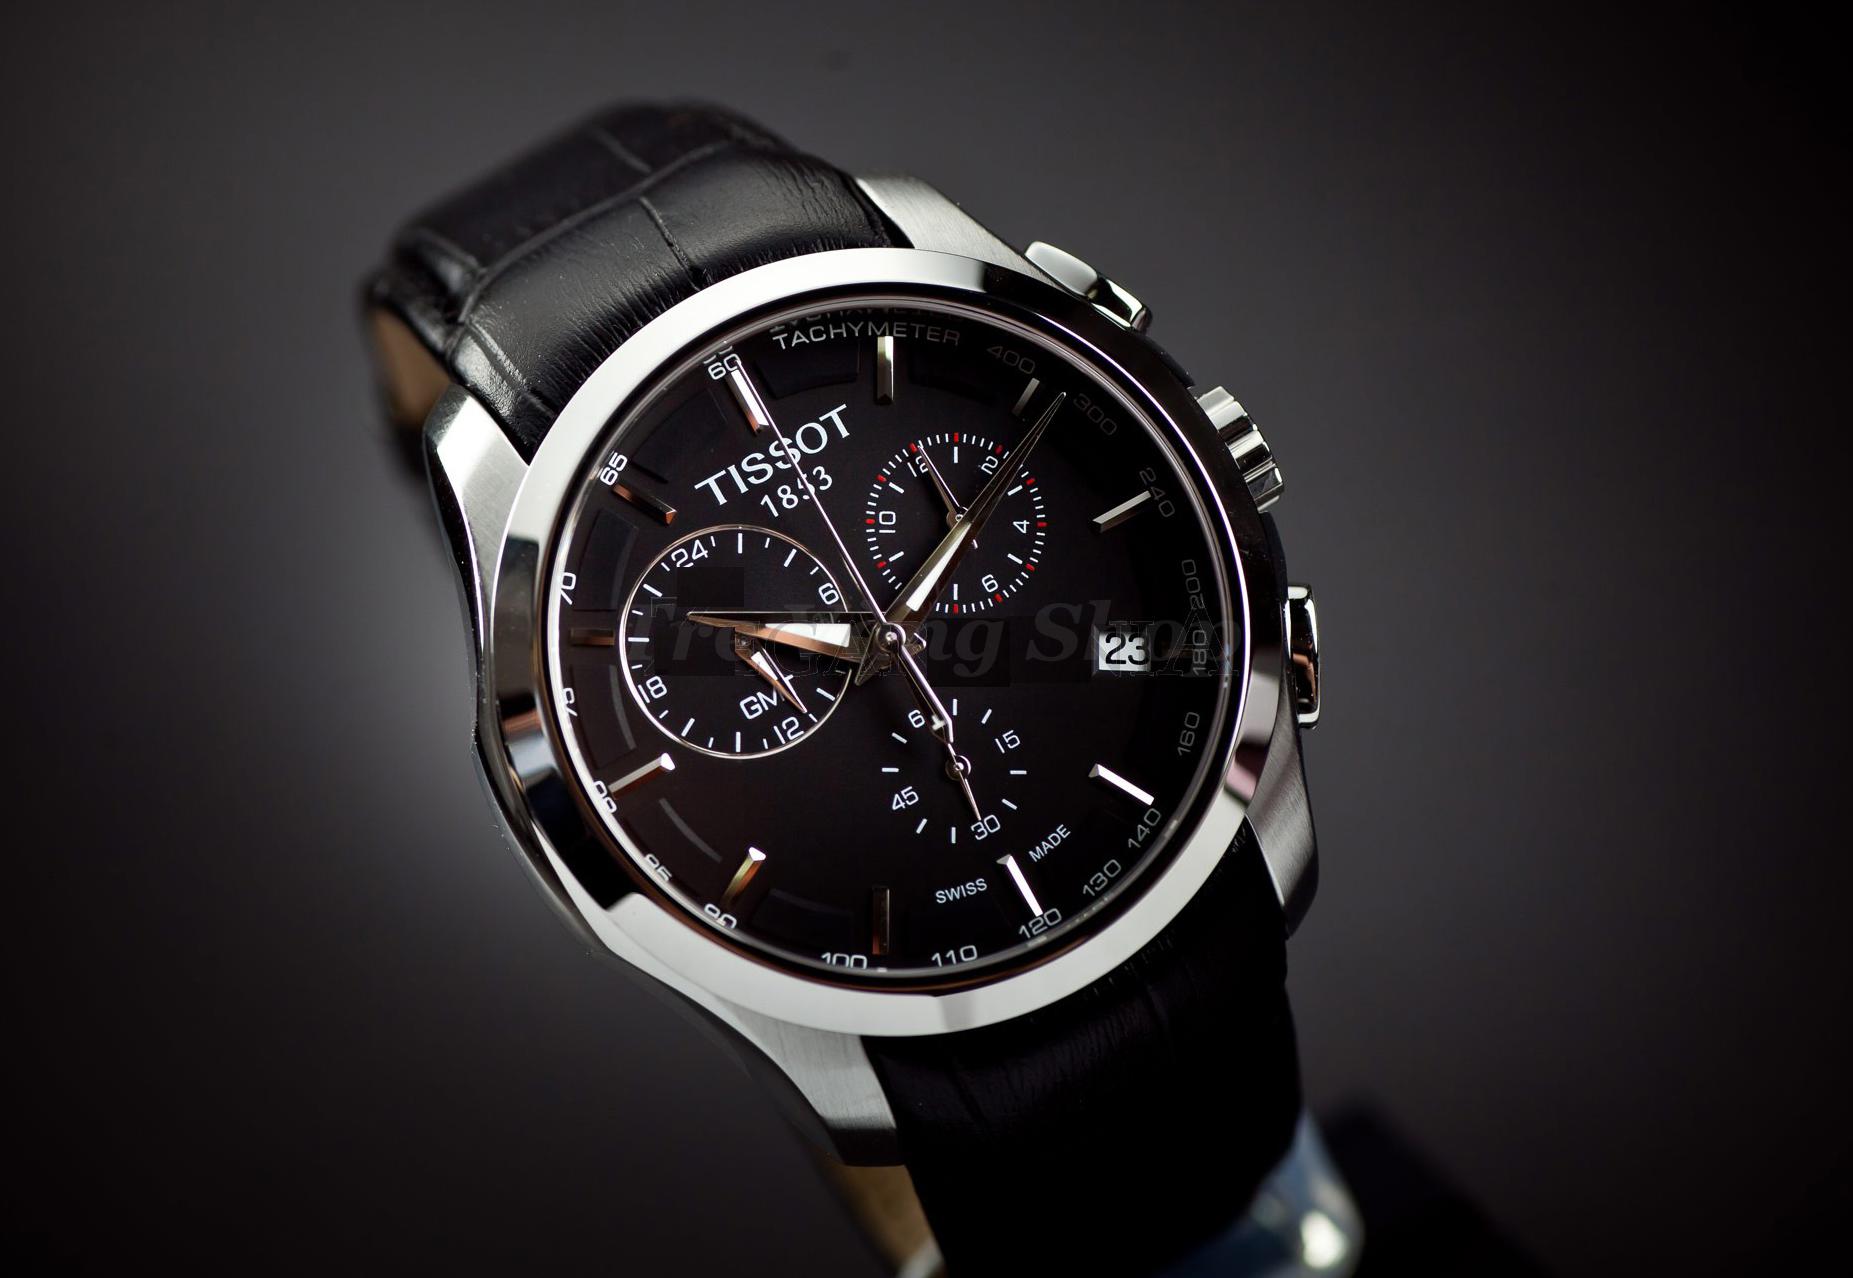 Mặt đồng hồ nam Tissot 1853 T035.439.16.051.00 T-Sport .